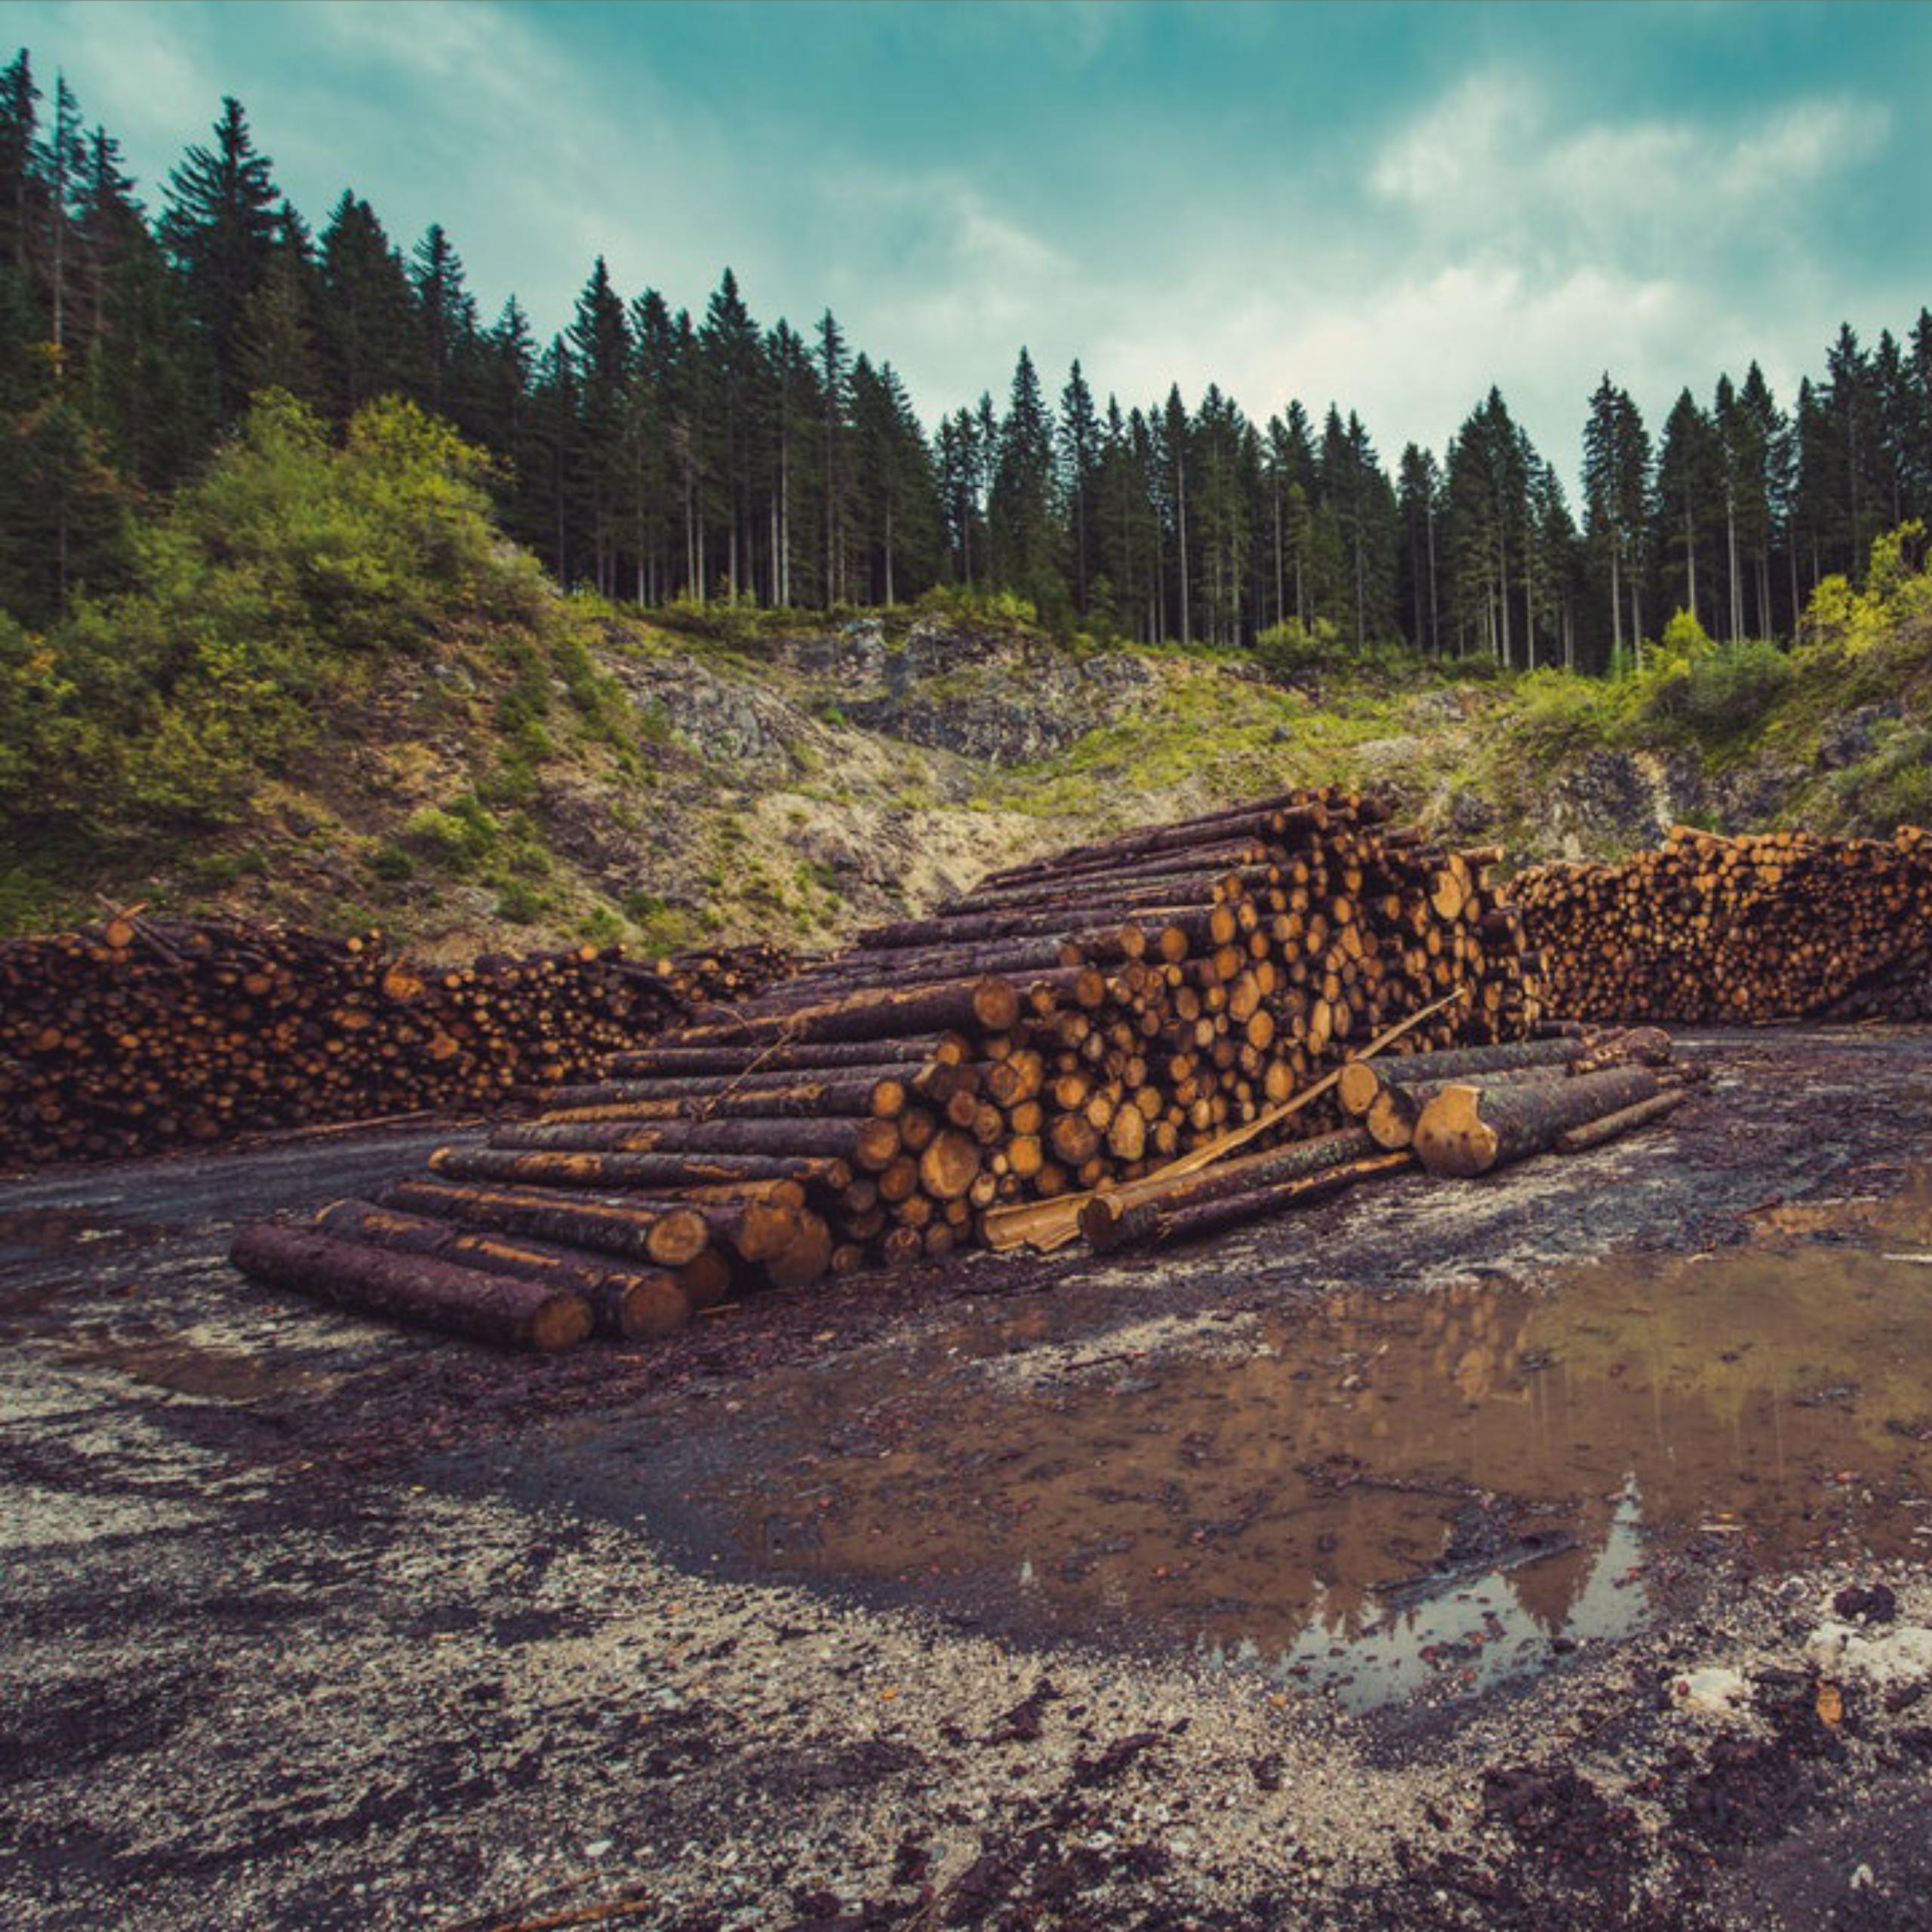 ReThink Disposable_Trees_Blog_Adobe Spark Image